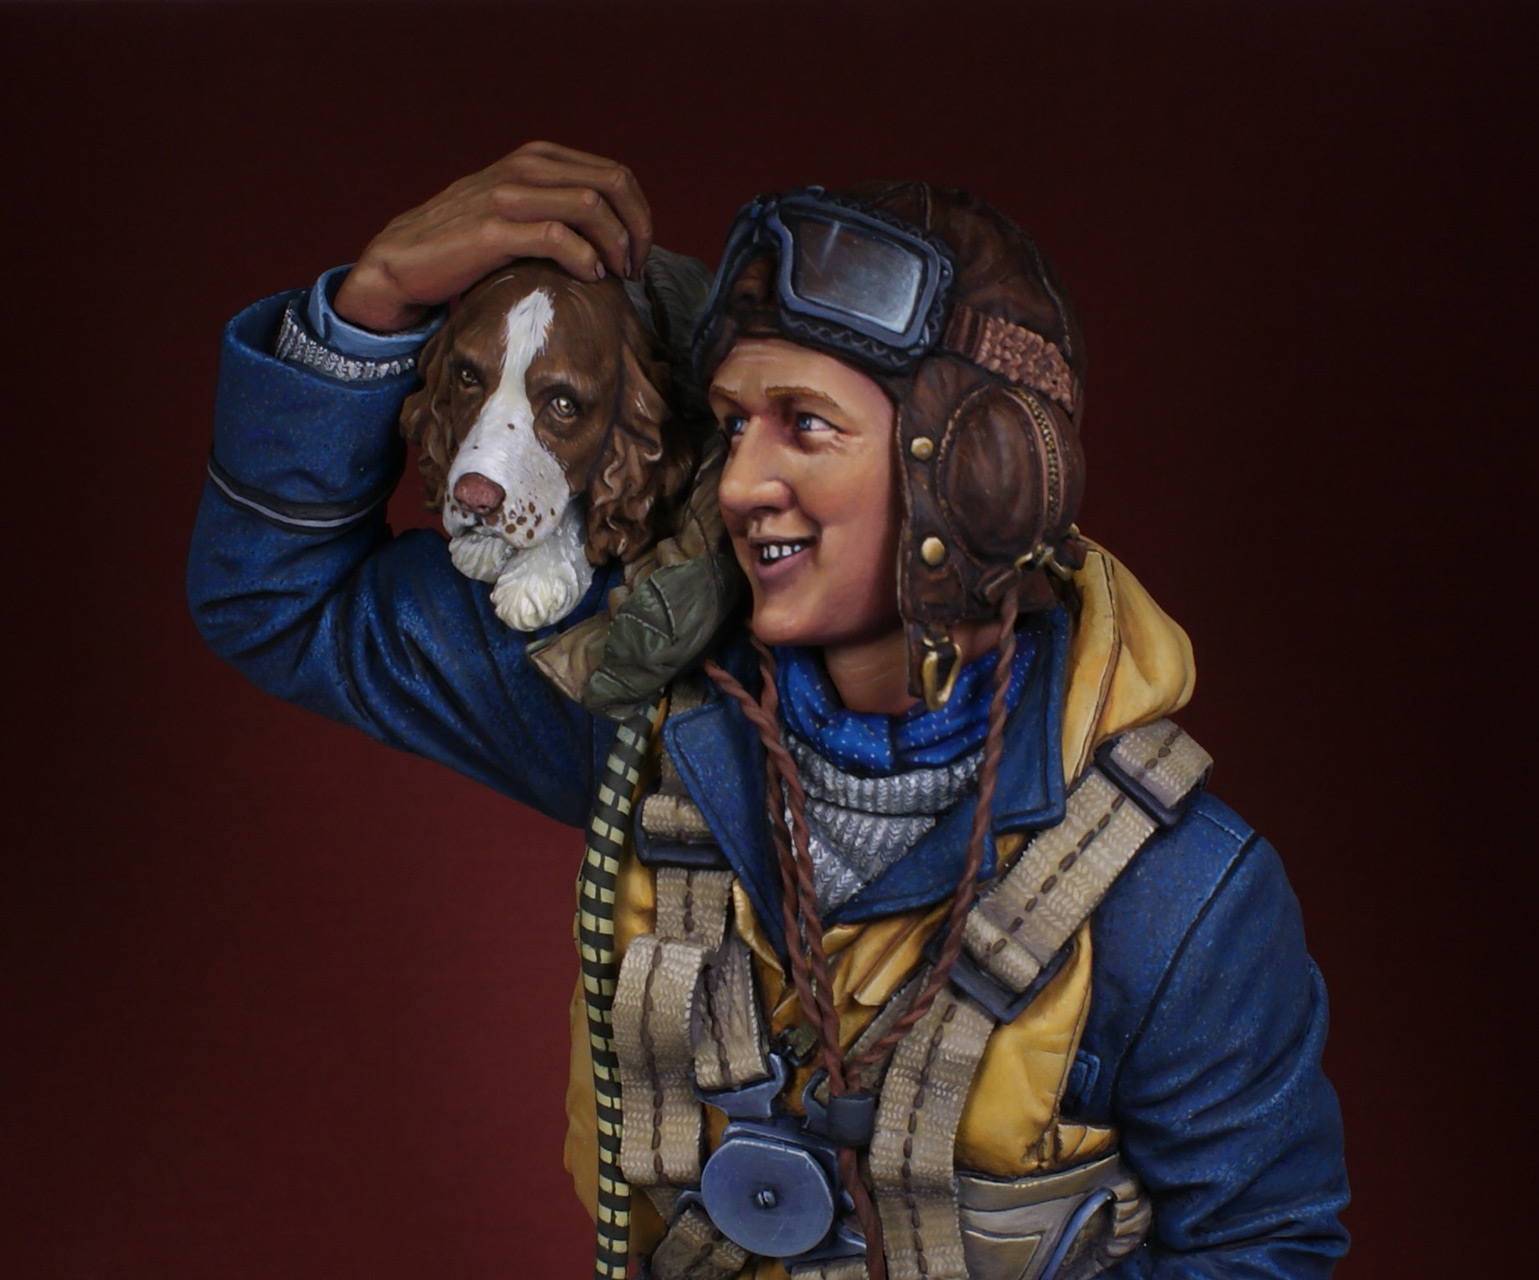 Фигурки: Летчик-истребитель. Битва за Британию, фото #6